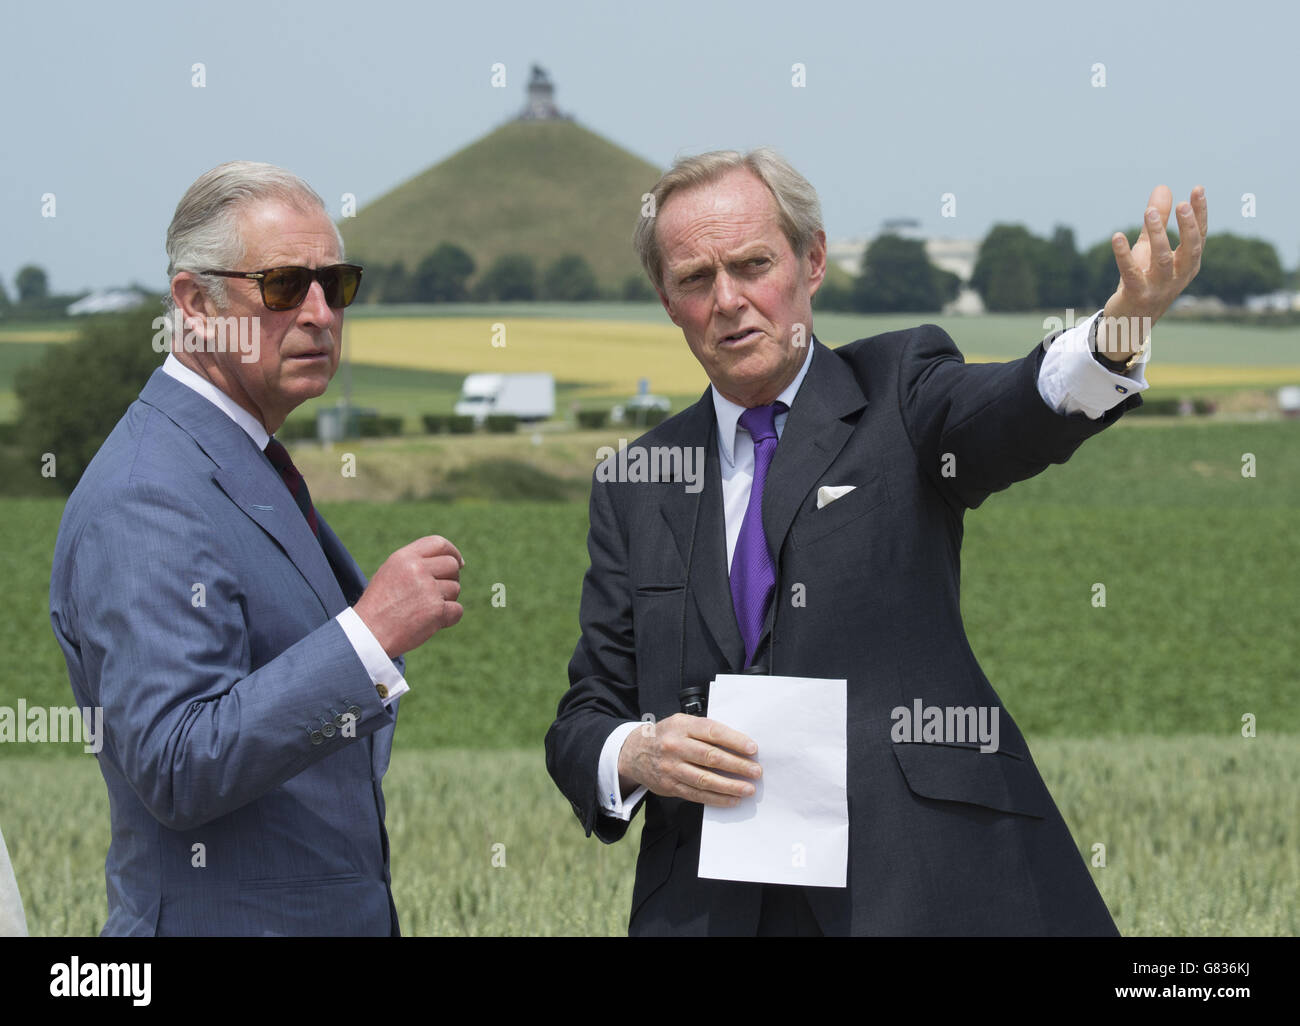 Battle of Waterloo anniversary - Stock Image